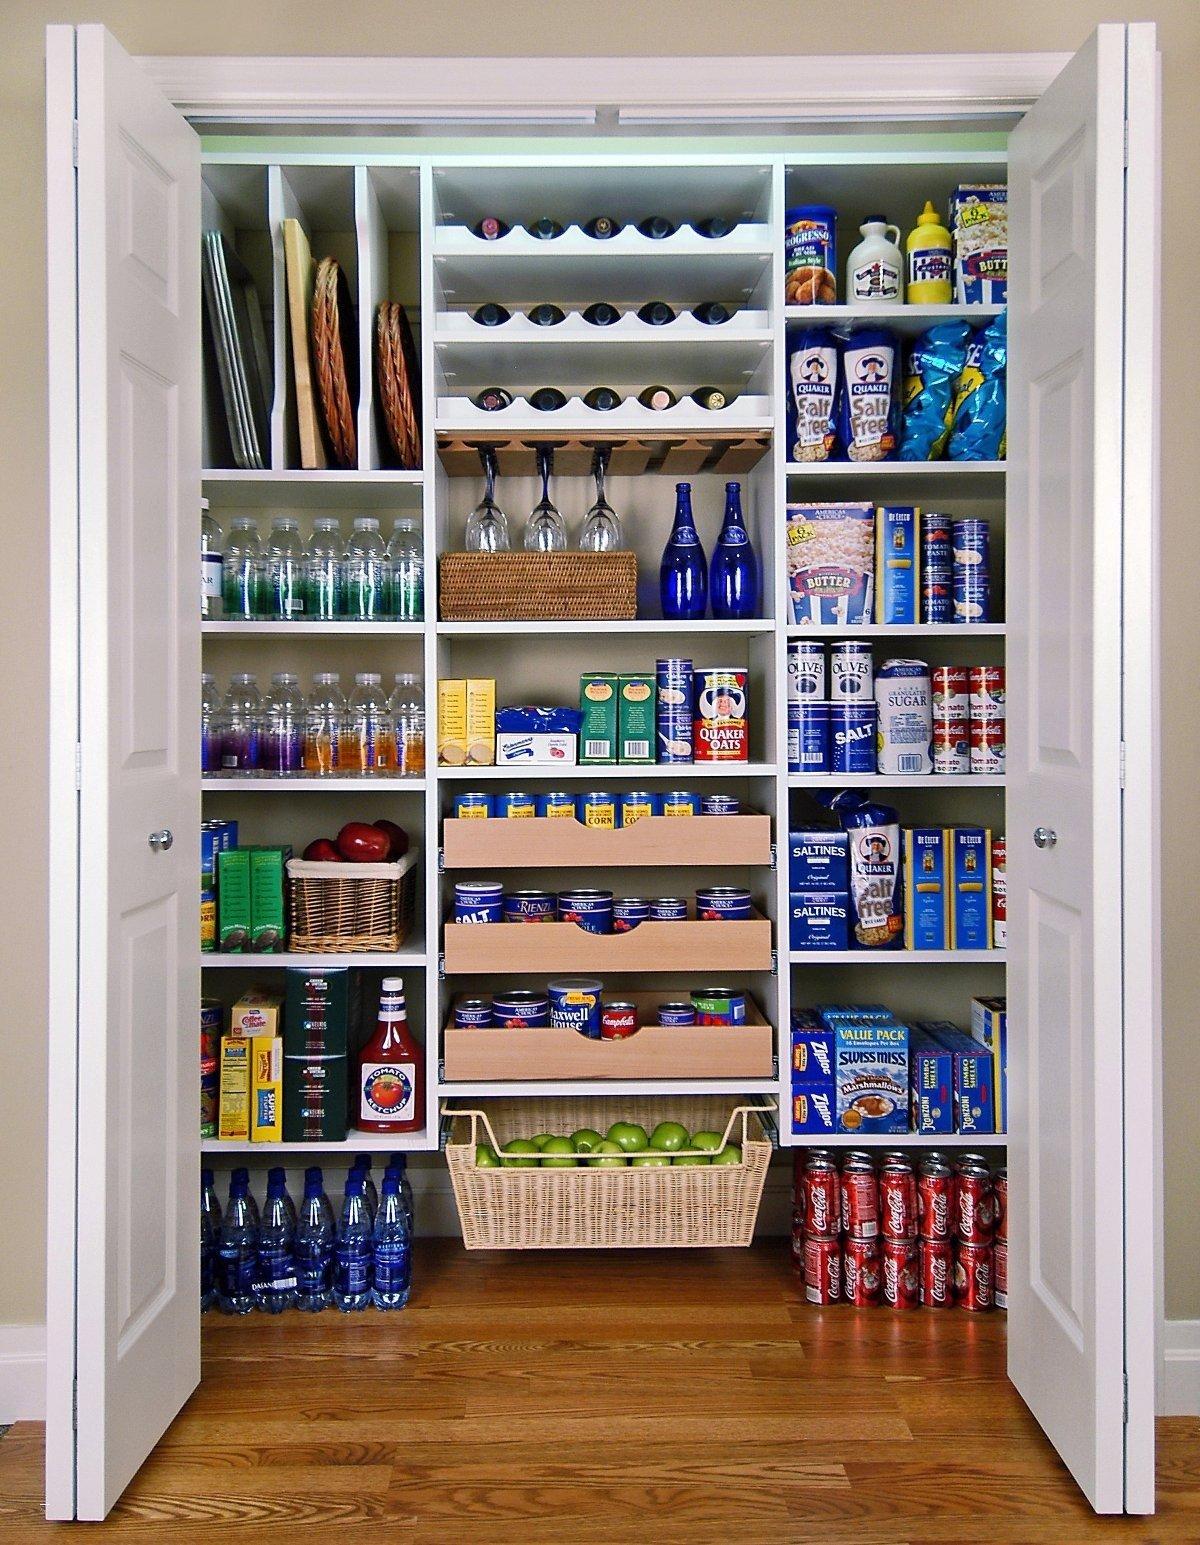 10 Attractive Diy Organization Ideas For Small Spaces diy kitchen storage ideas amazing diy organization ideas for small 2020